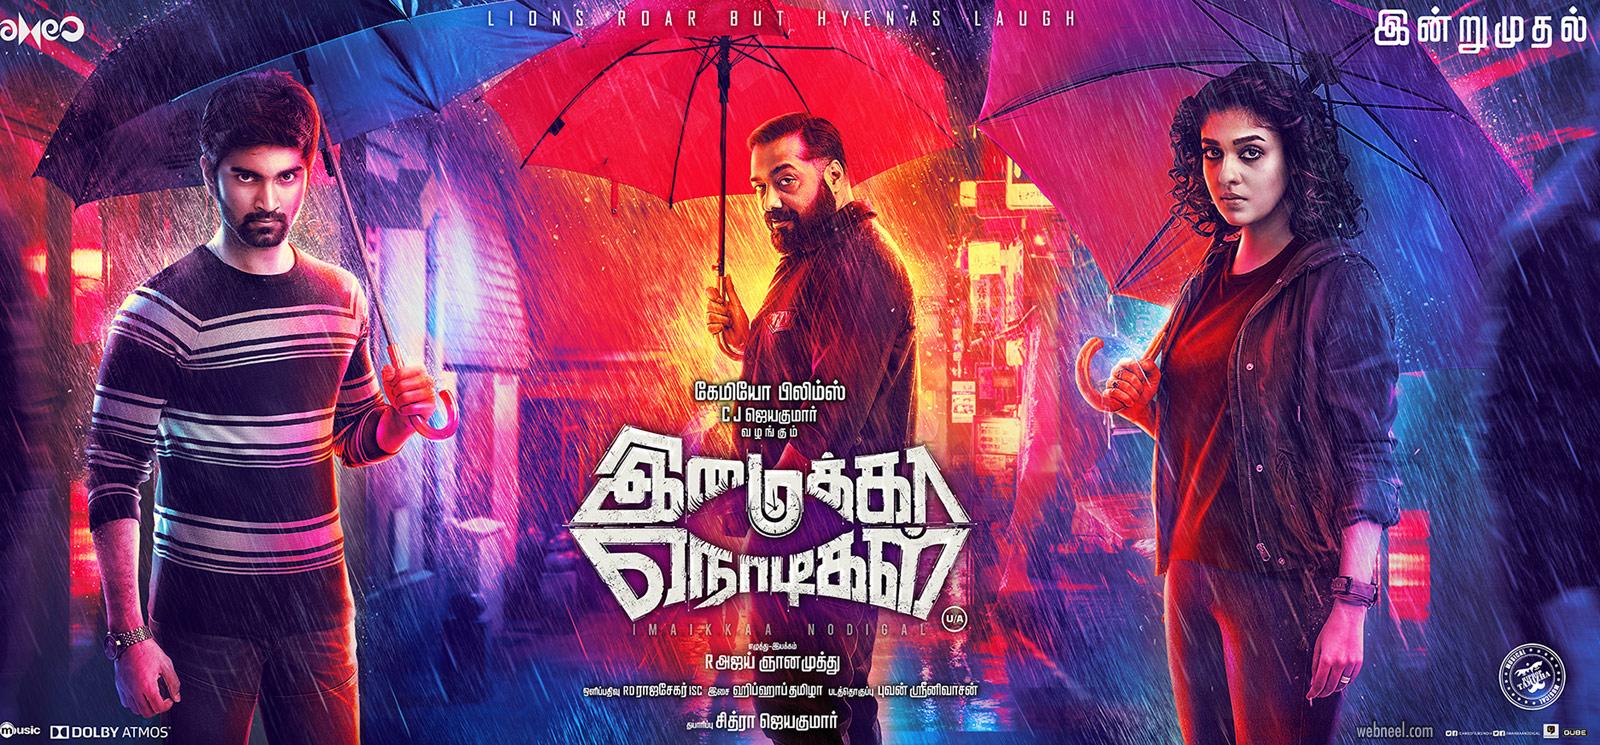 movie poster design kollywood tamil imaikanodigal